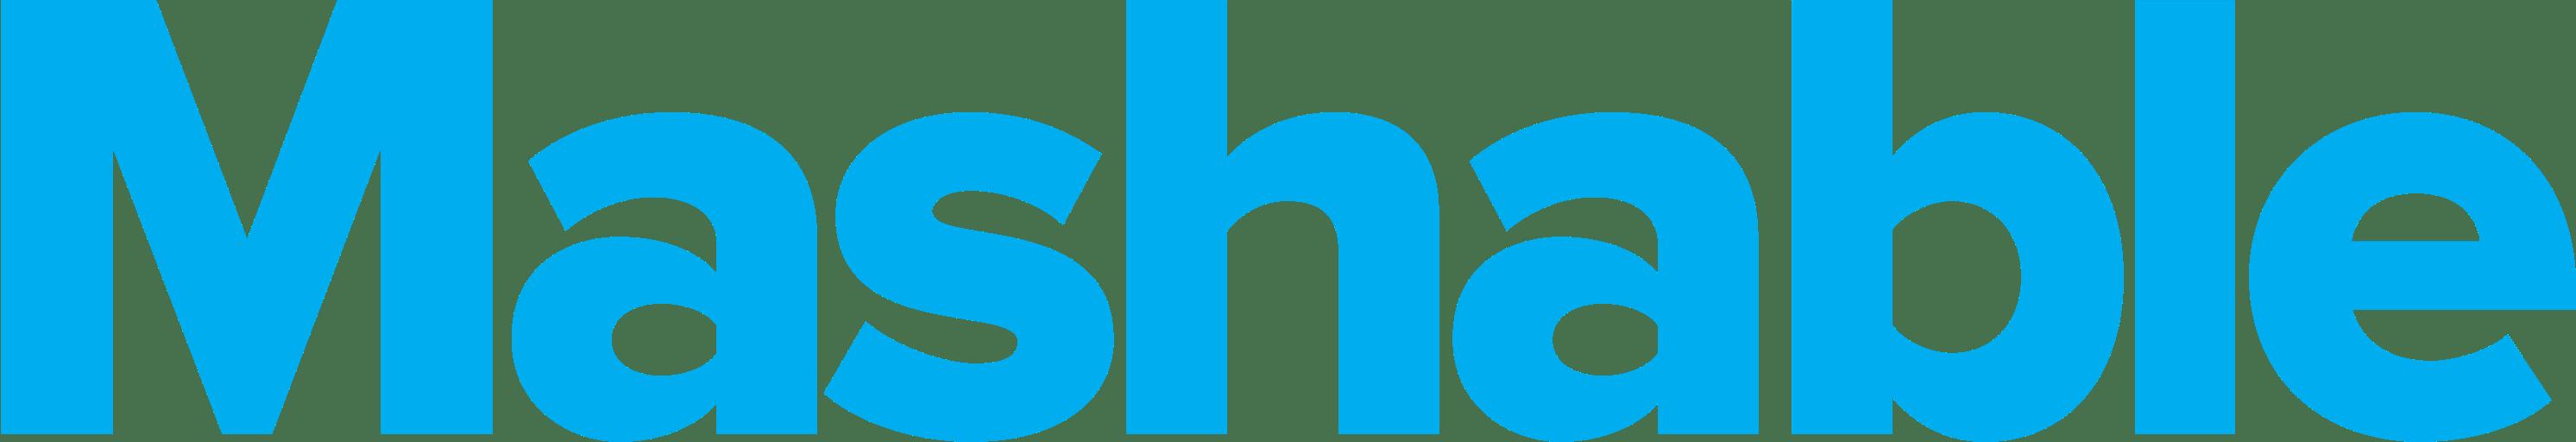 https://wordplayagency.com/wp-content/uploads/2019/03/better-mashable-logo.png